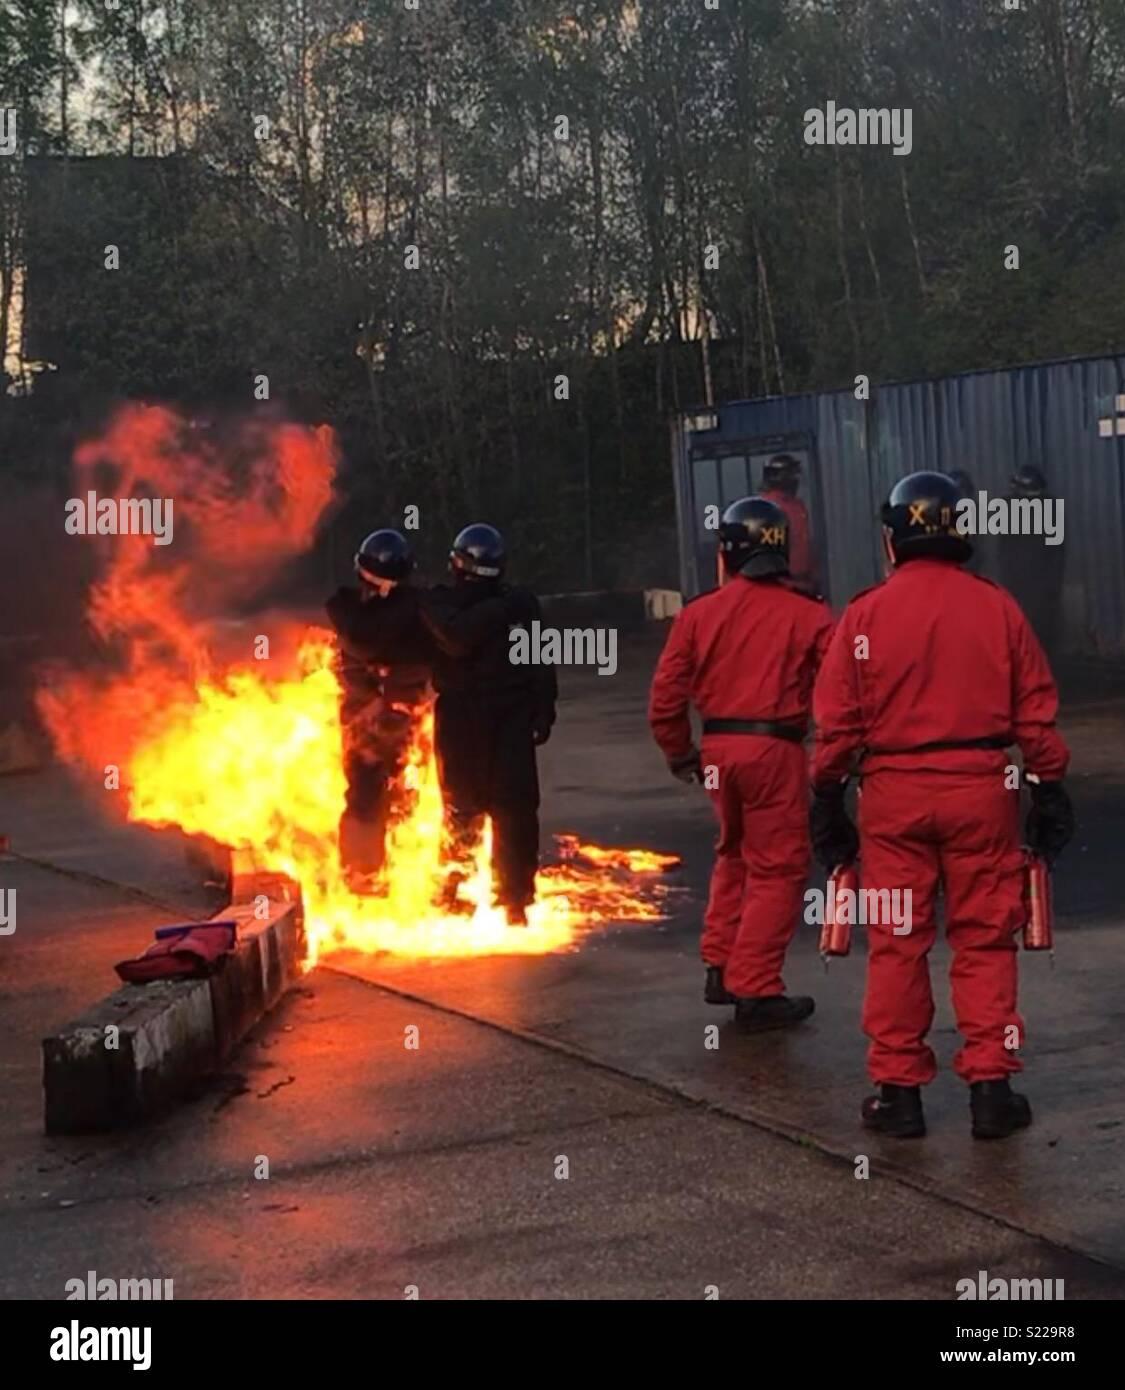 Polizisten benzin Bombe Ausbildung Stockfoto